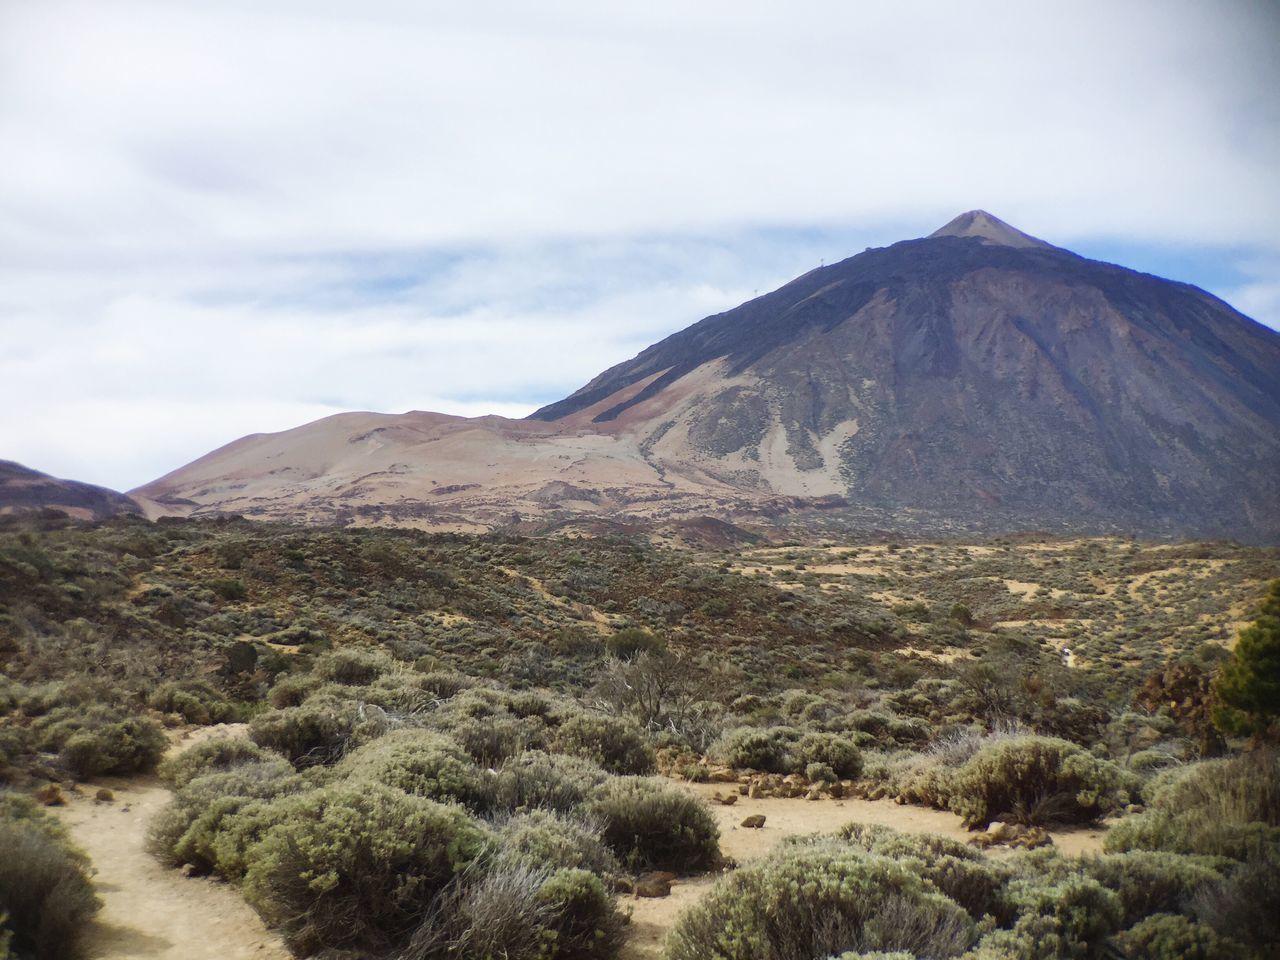 Tenerife El Teide Parque Nacional Del Teide Mountain Desert